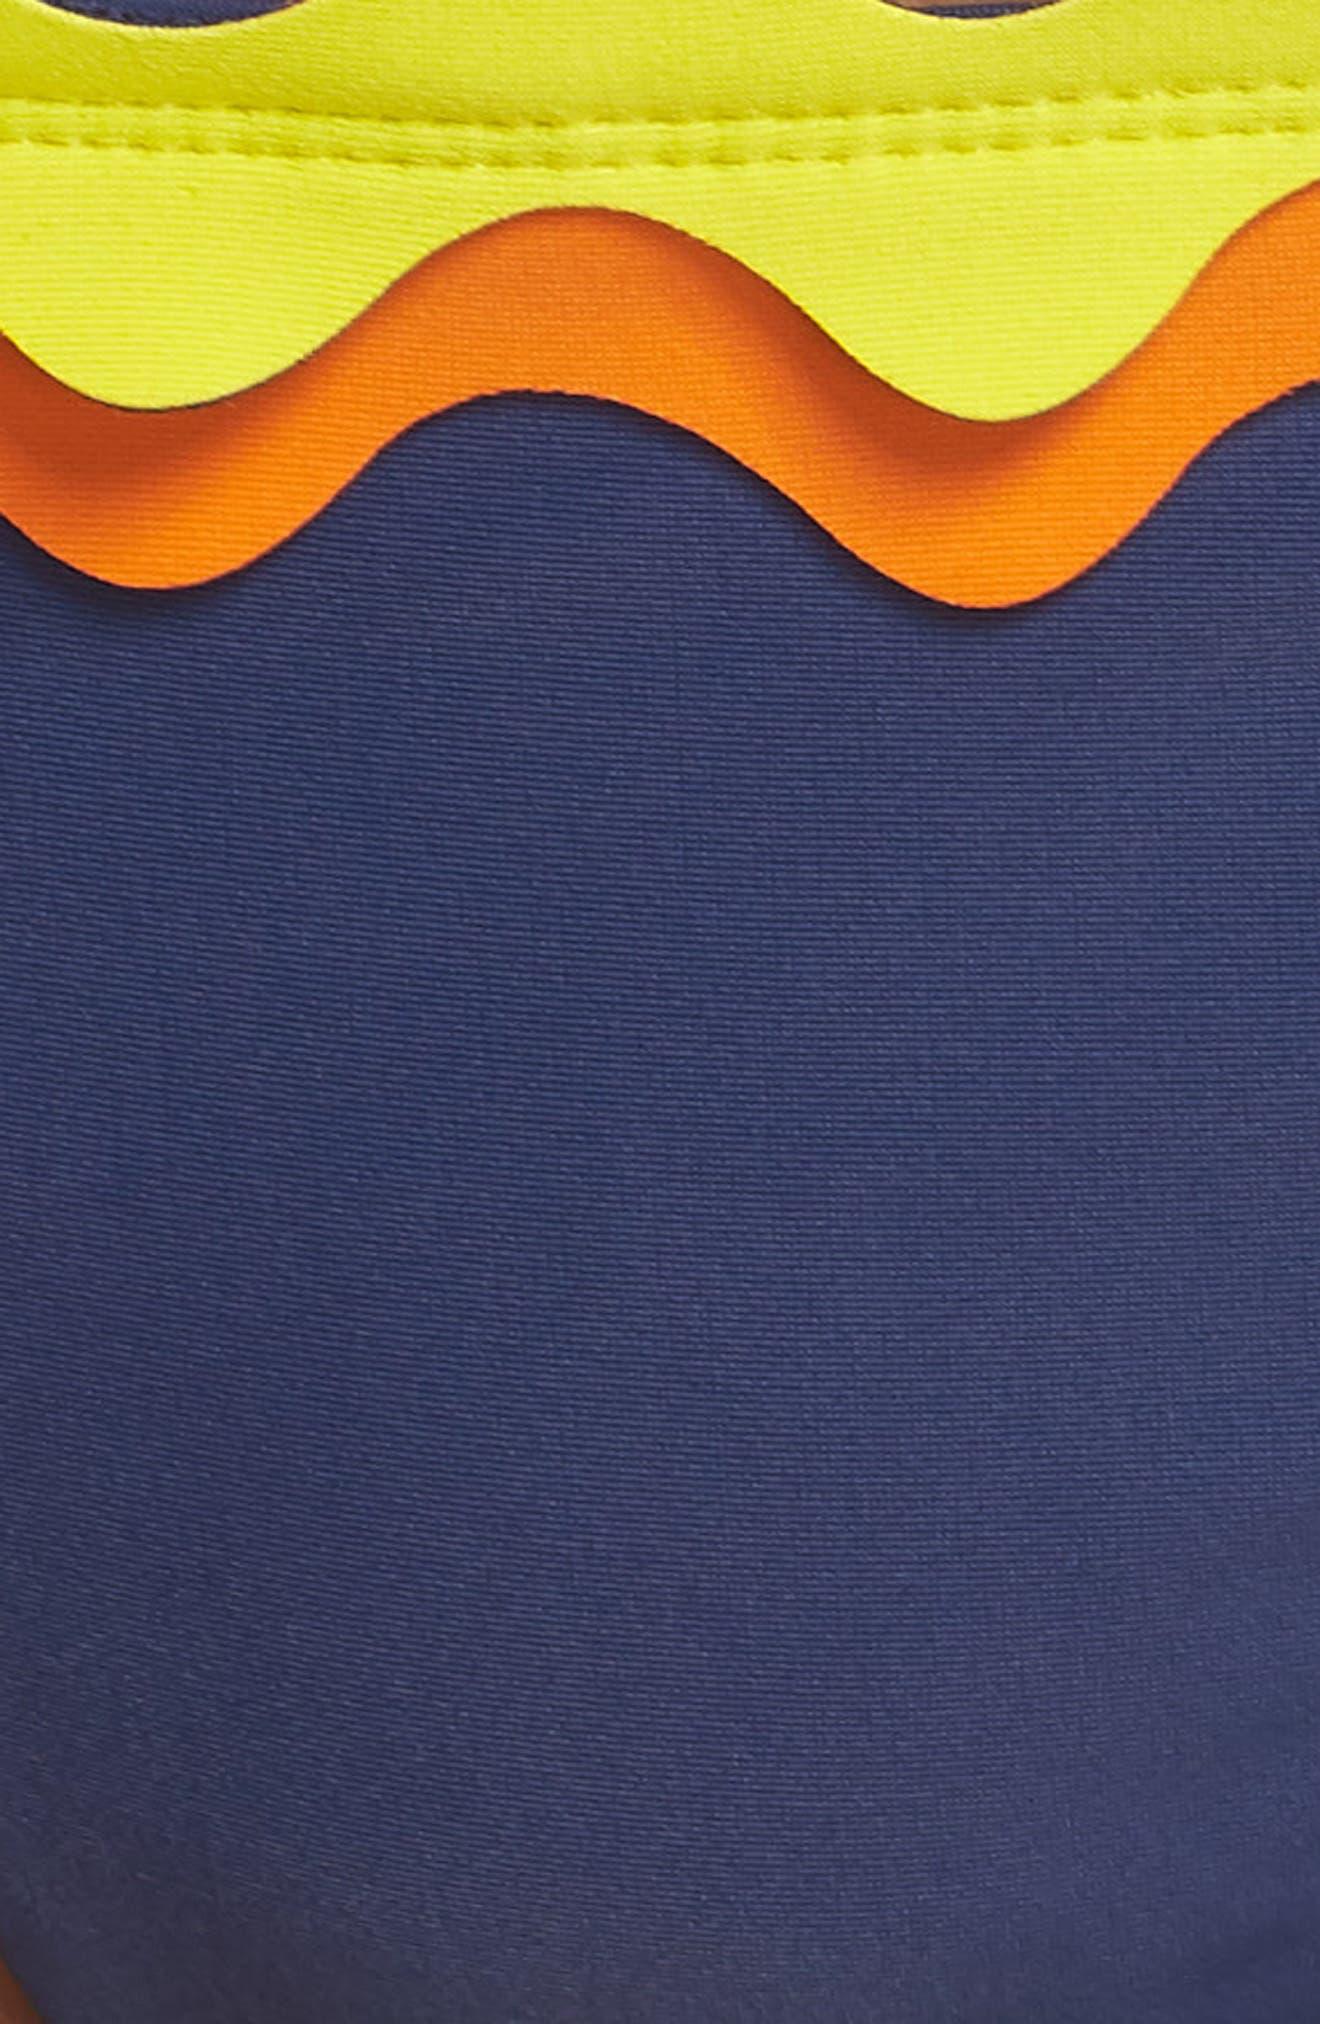 Oh My Bikini Bottoms,                             Alternate thumbnail 5, color,                             400